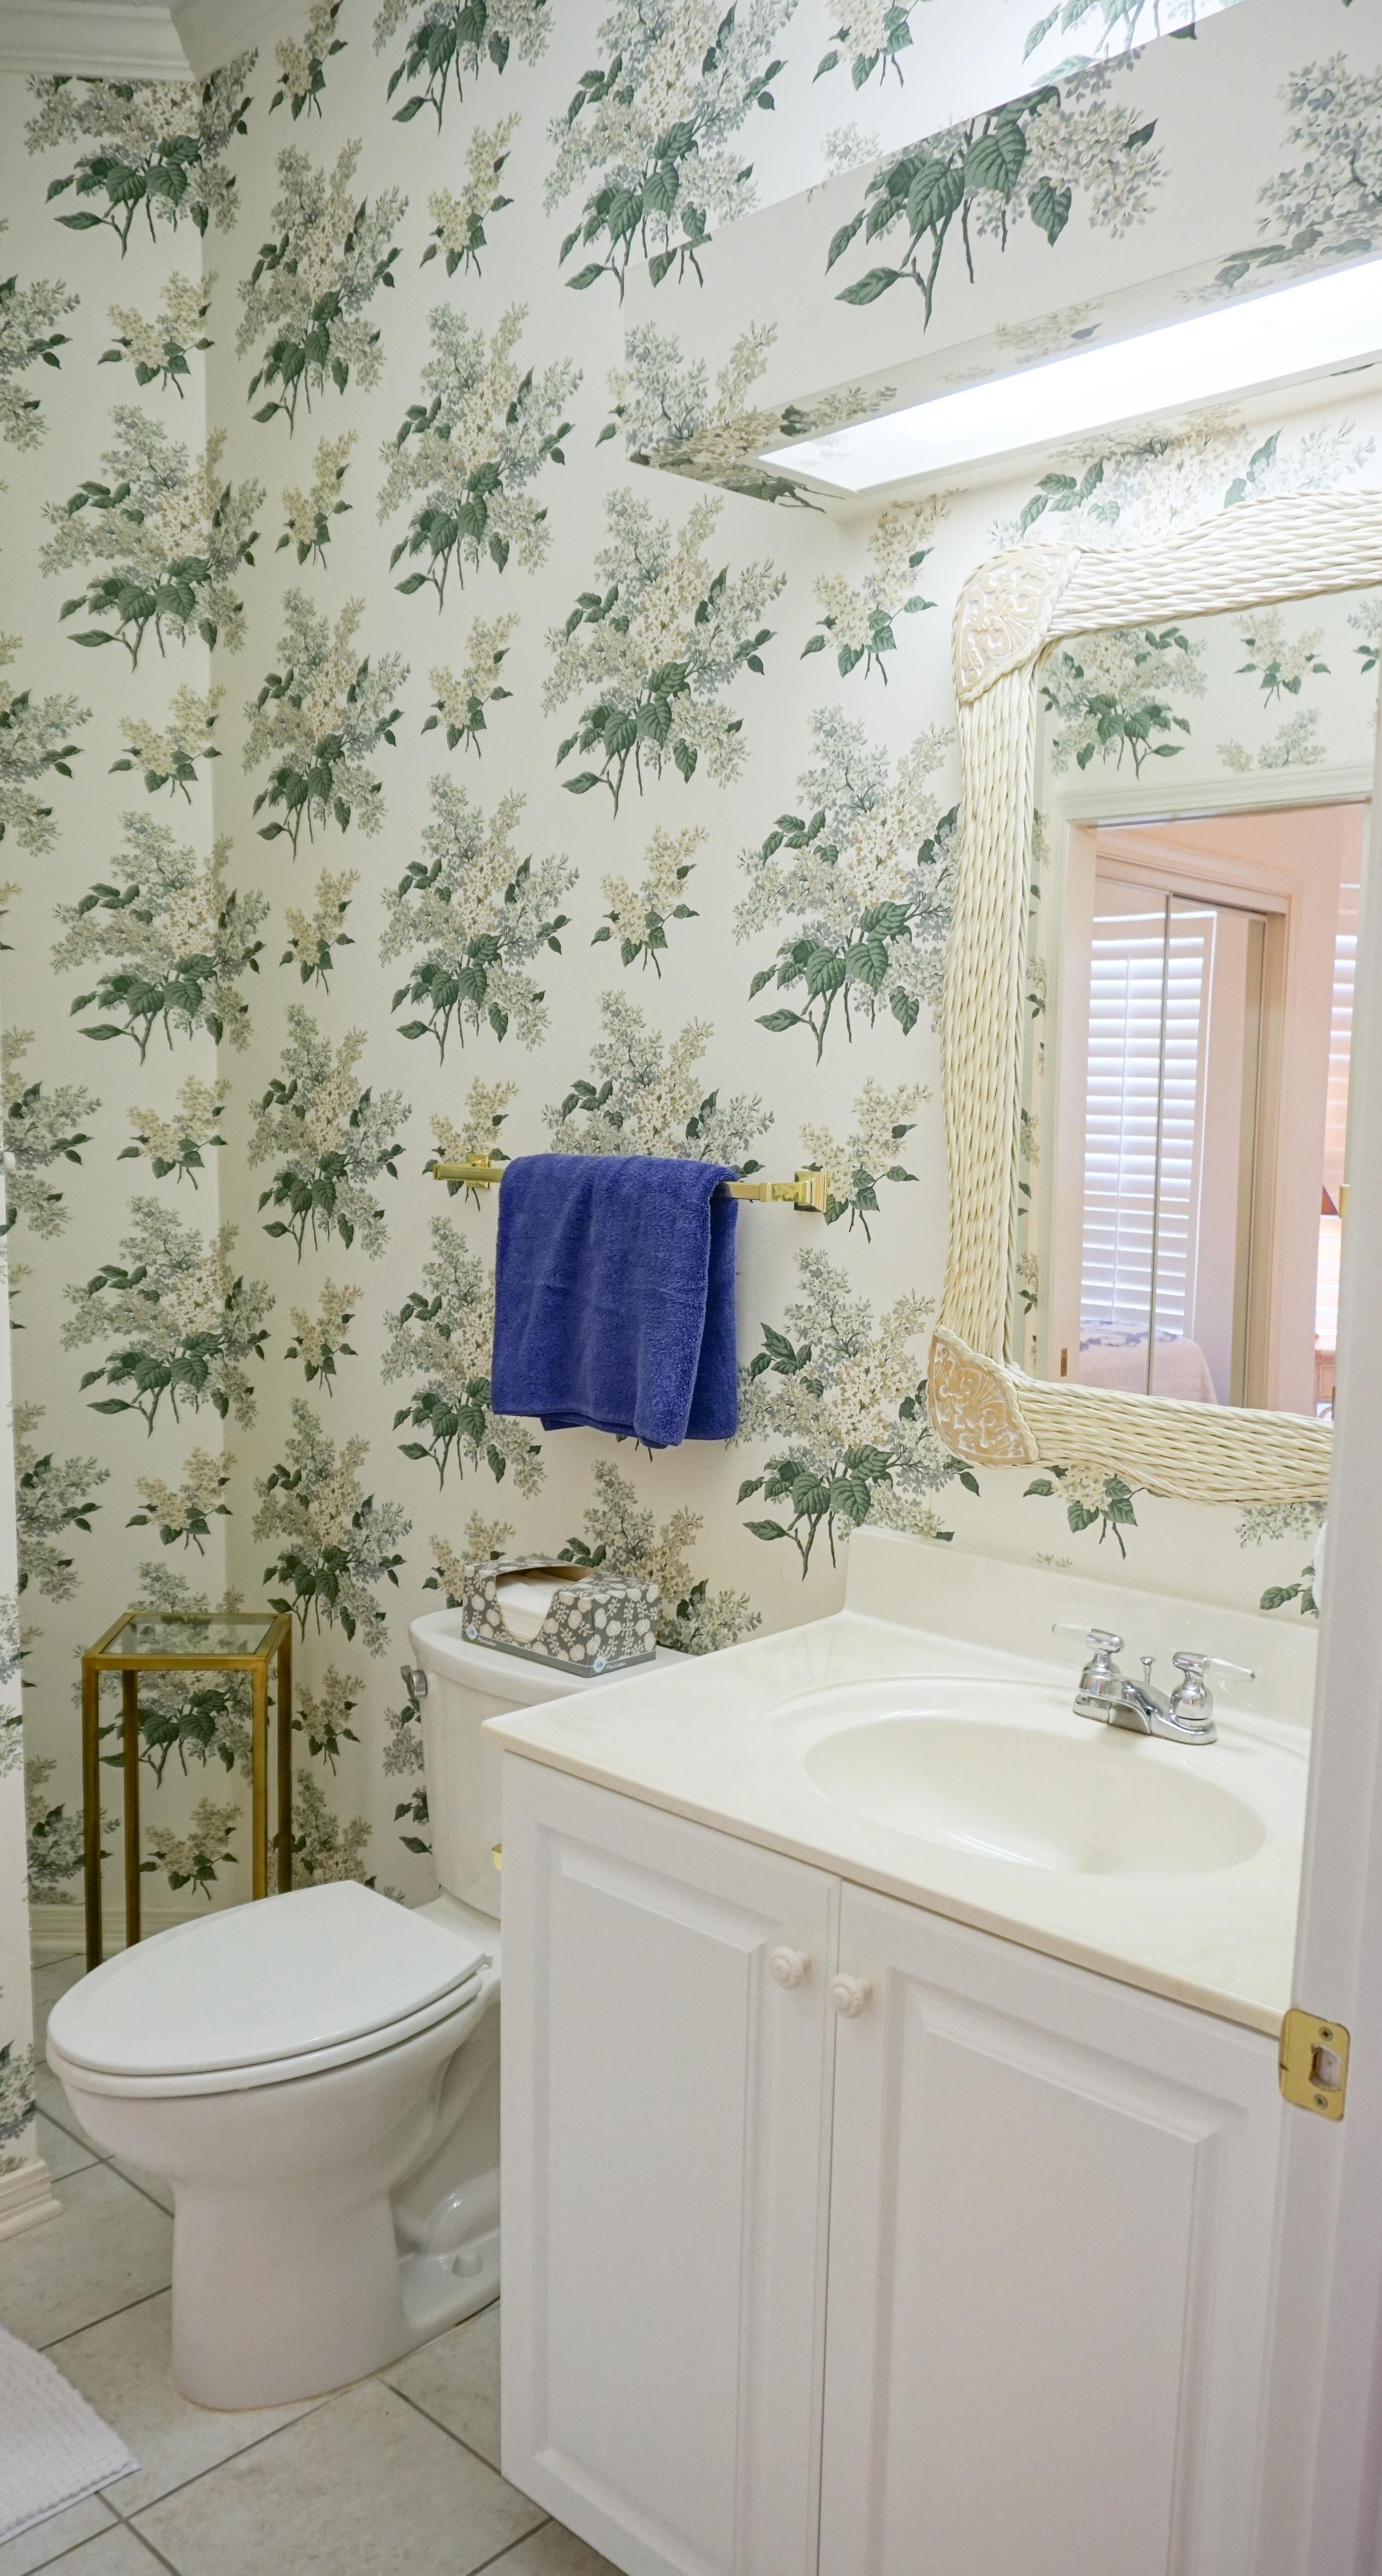 Ensenada Cinco 1730 House/Cottage rental in Pensacola Beach House Rentals in Pensacola Beach Florida - #25